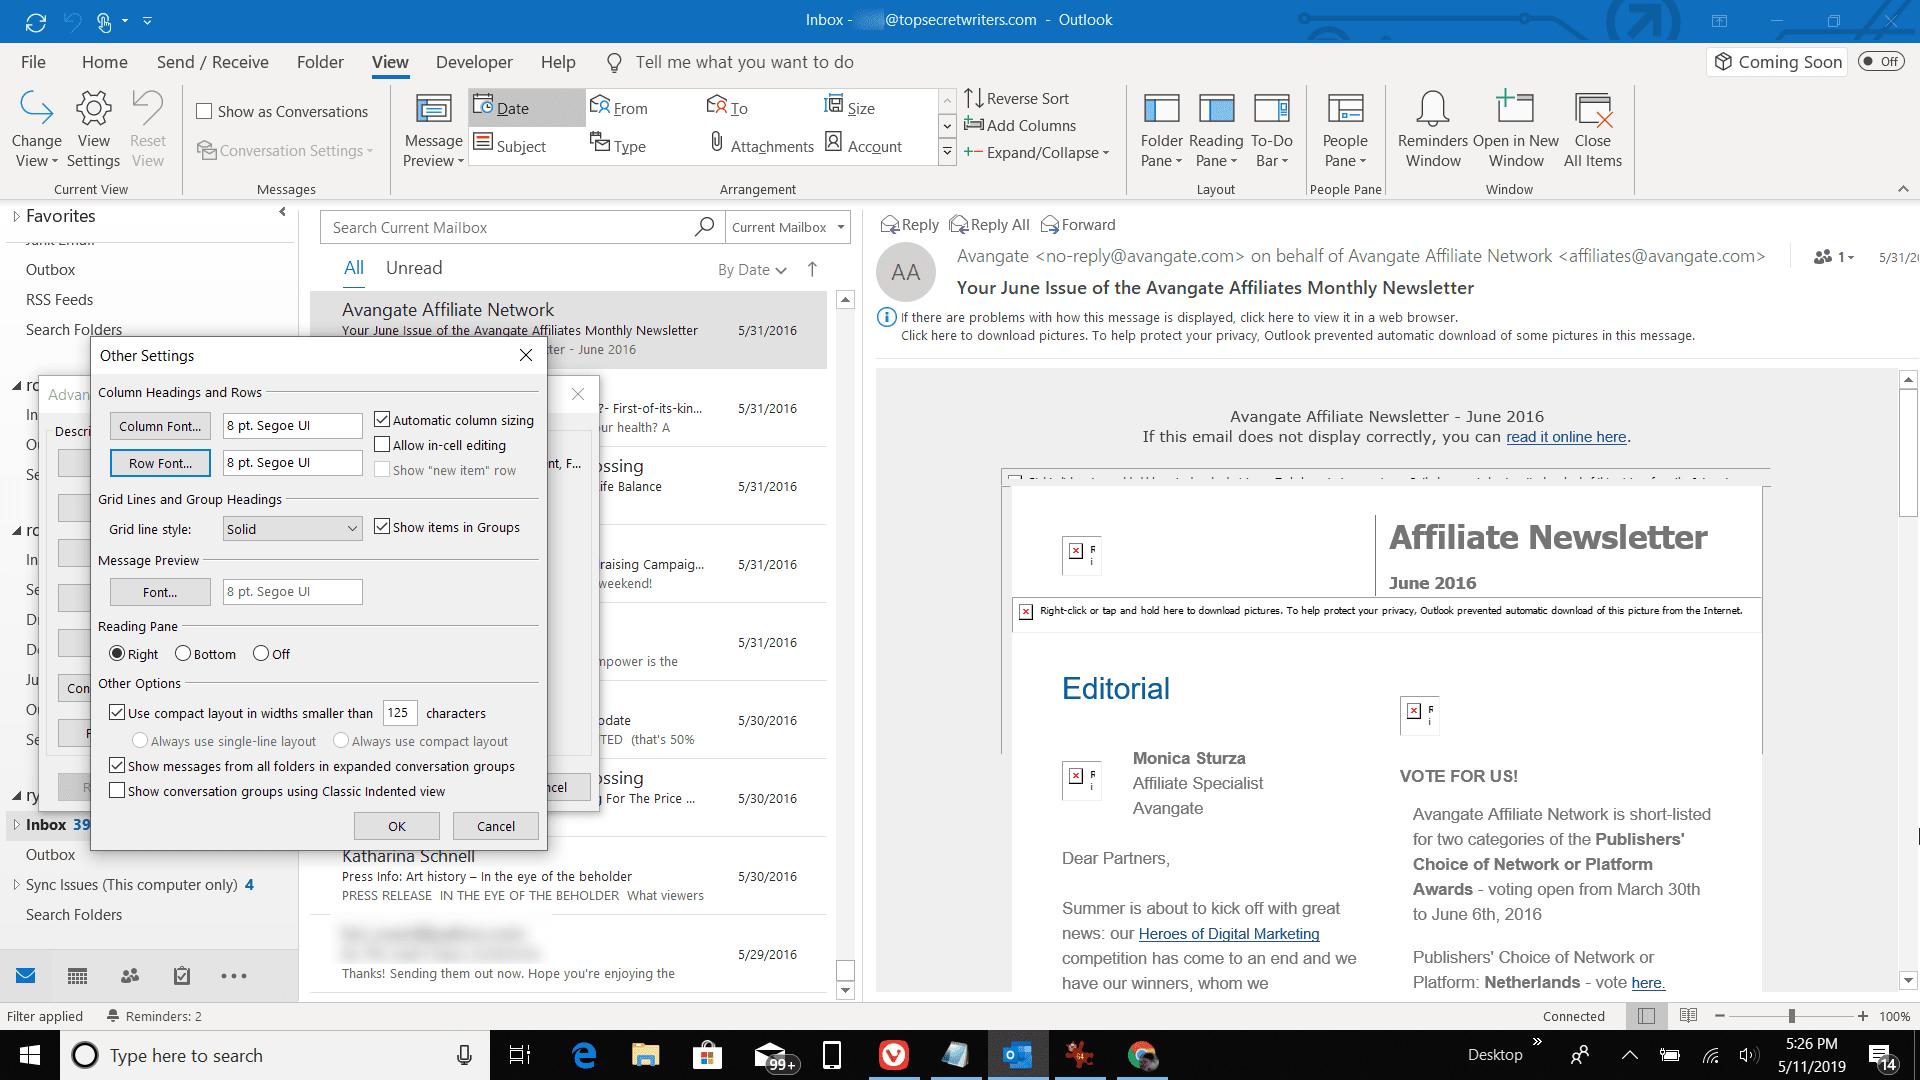 Screenshot of Row font in Outlook